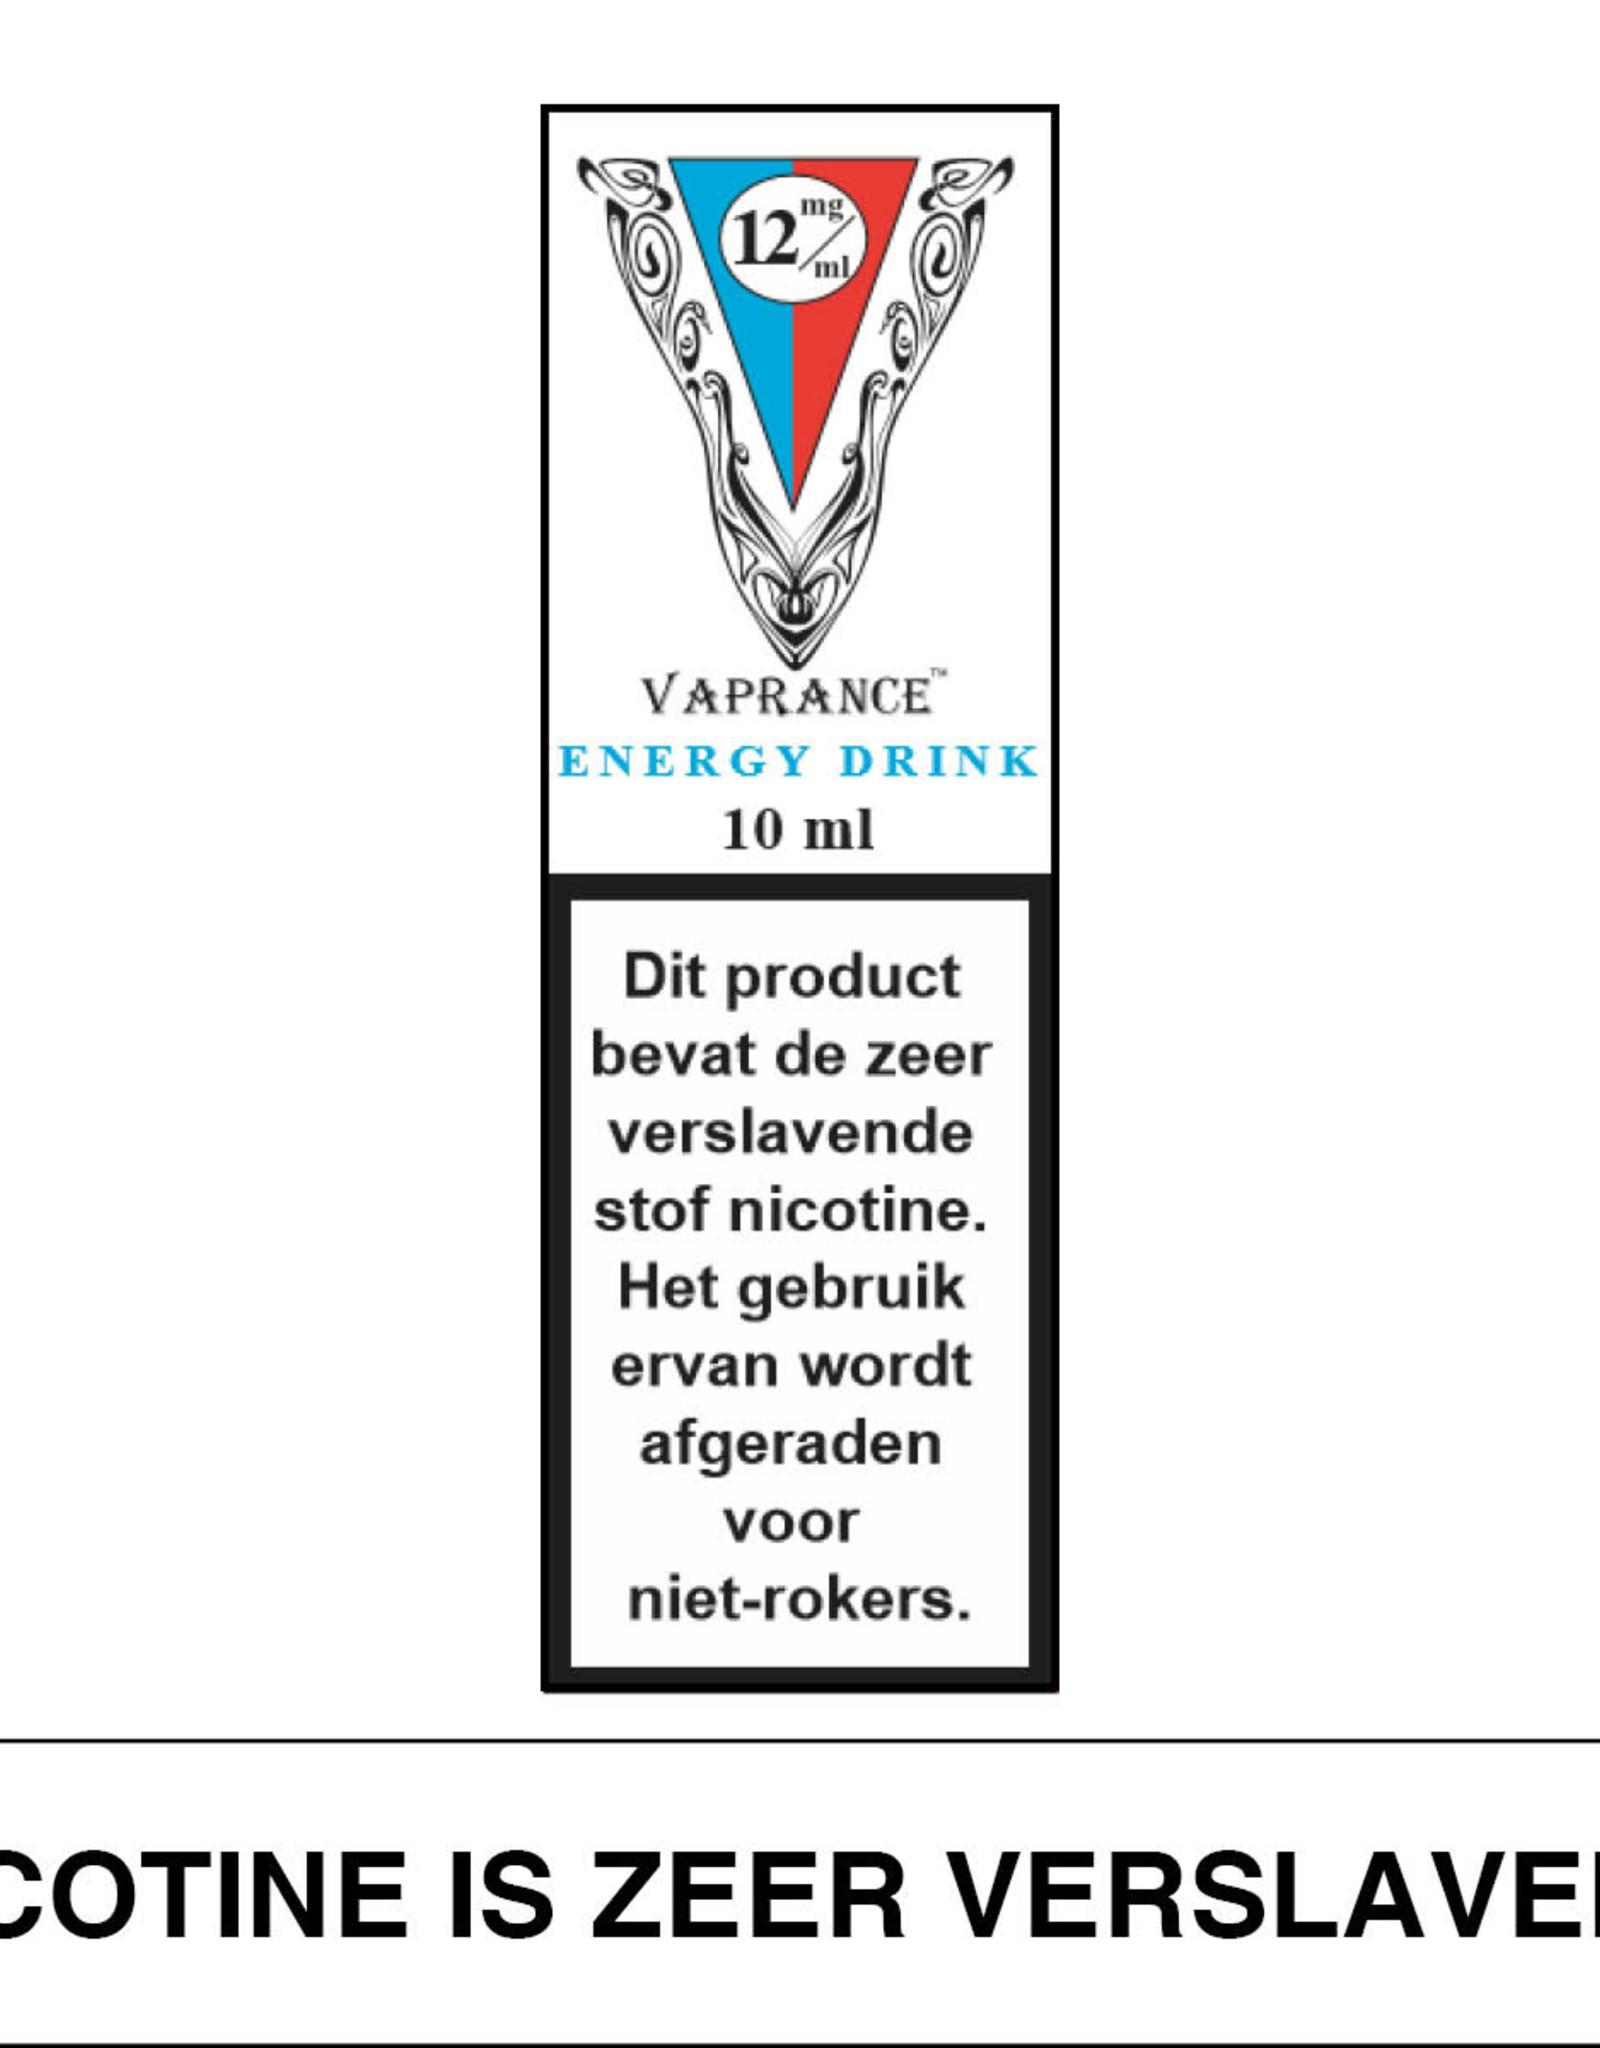 Vaprance Vaprance White Label Energy Drink 18 mg Nicotine